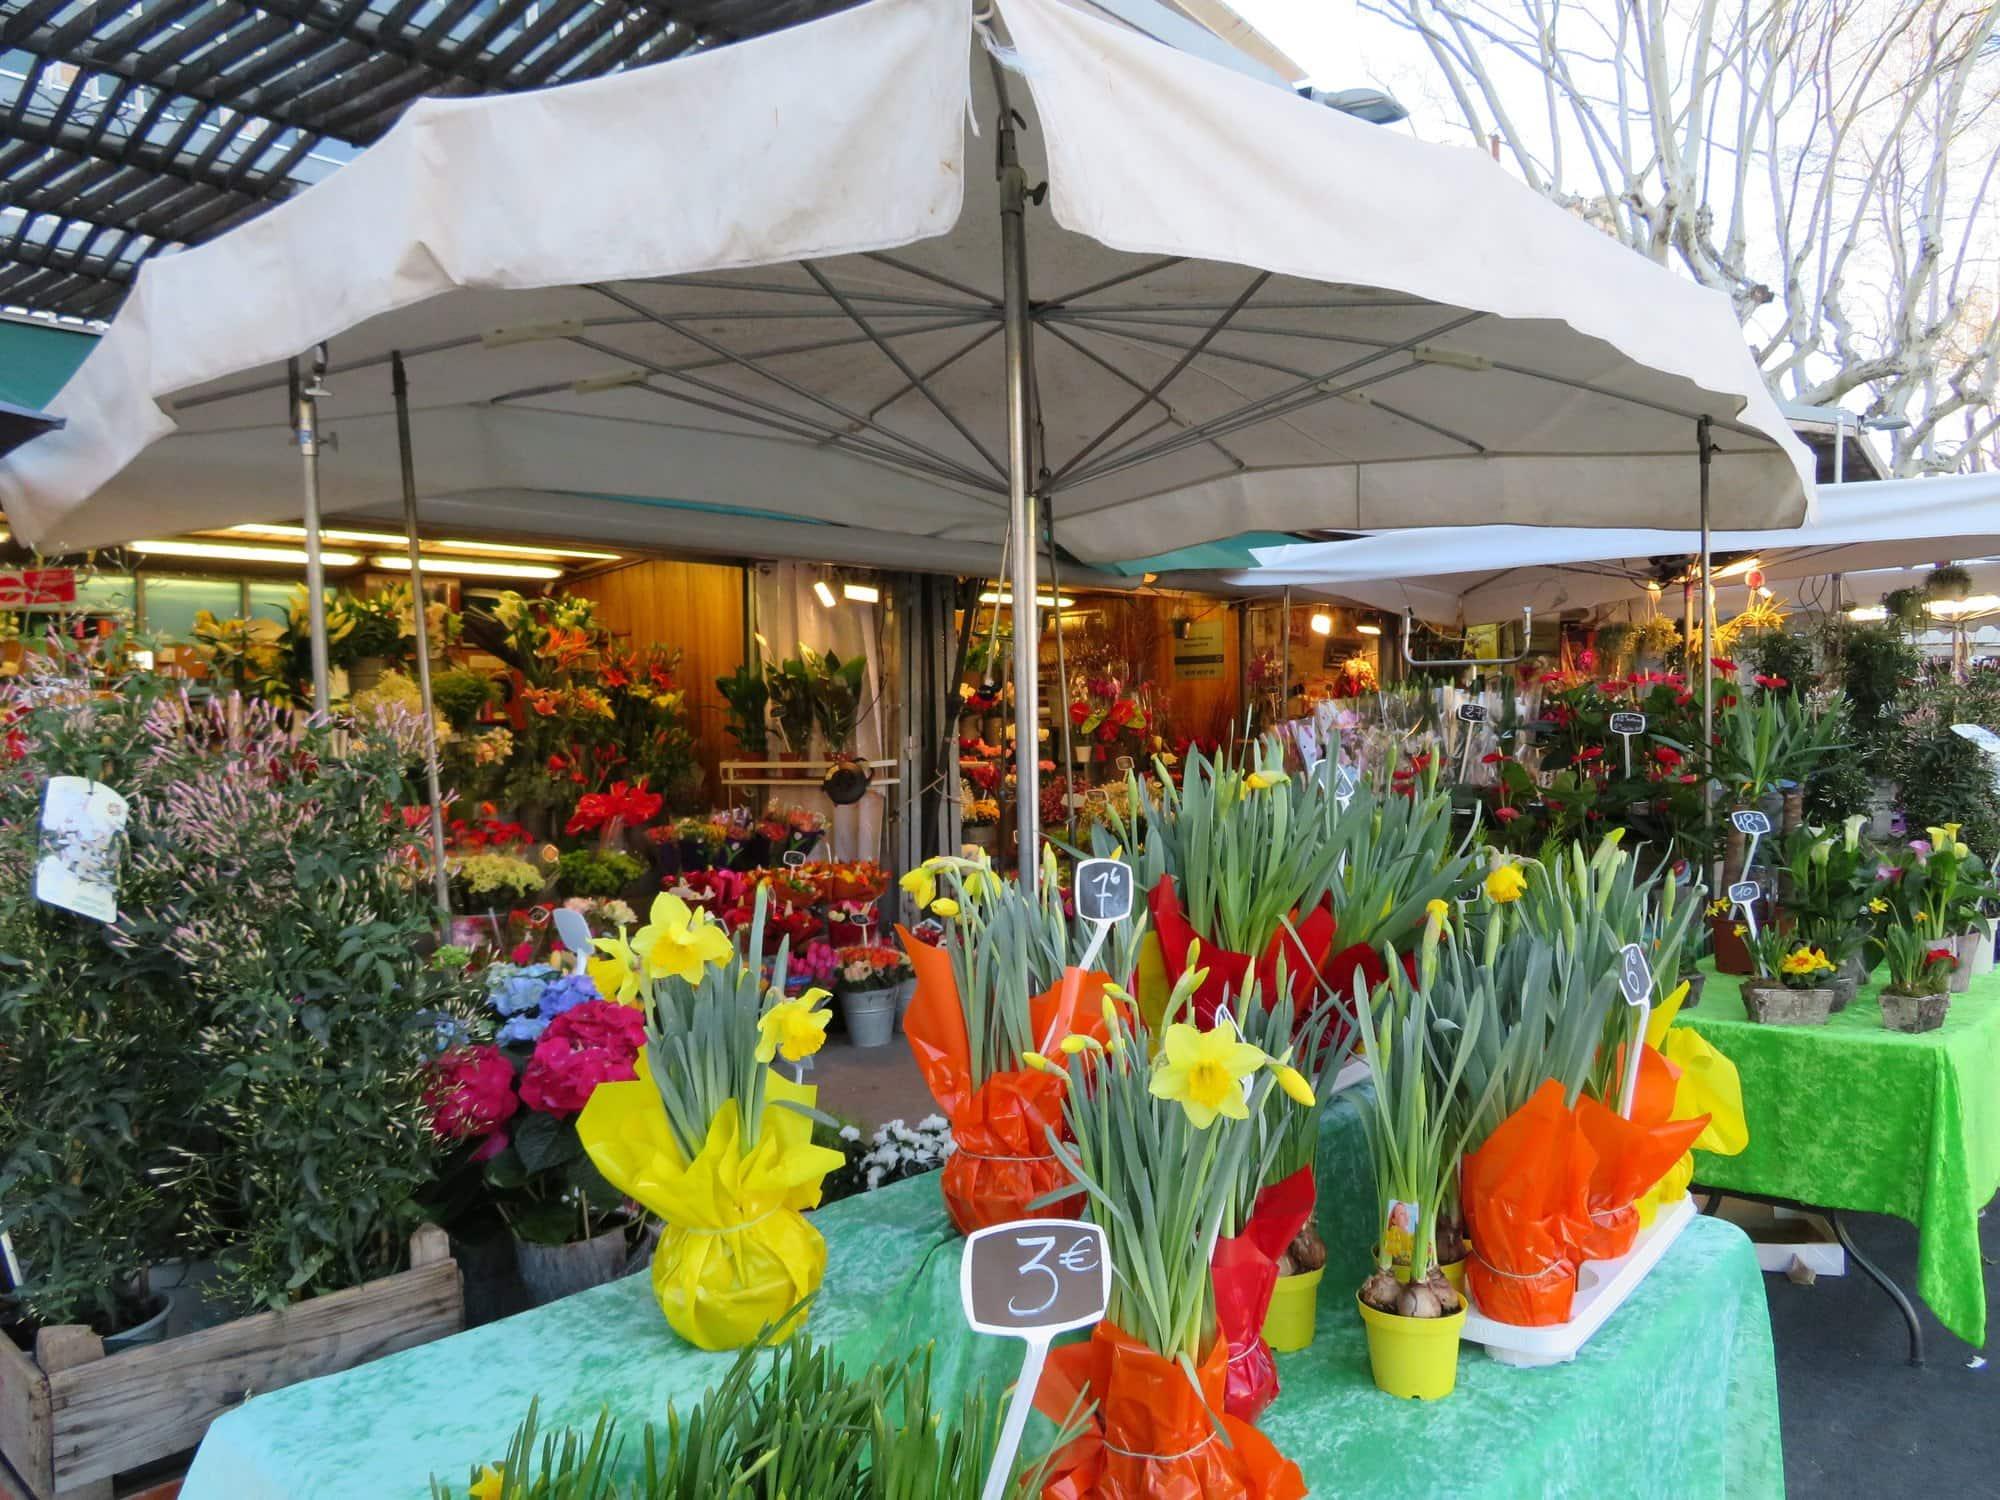 Flower market on Esplanade Charles de Gaulle in Montpellier, France